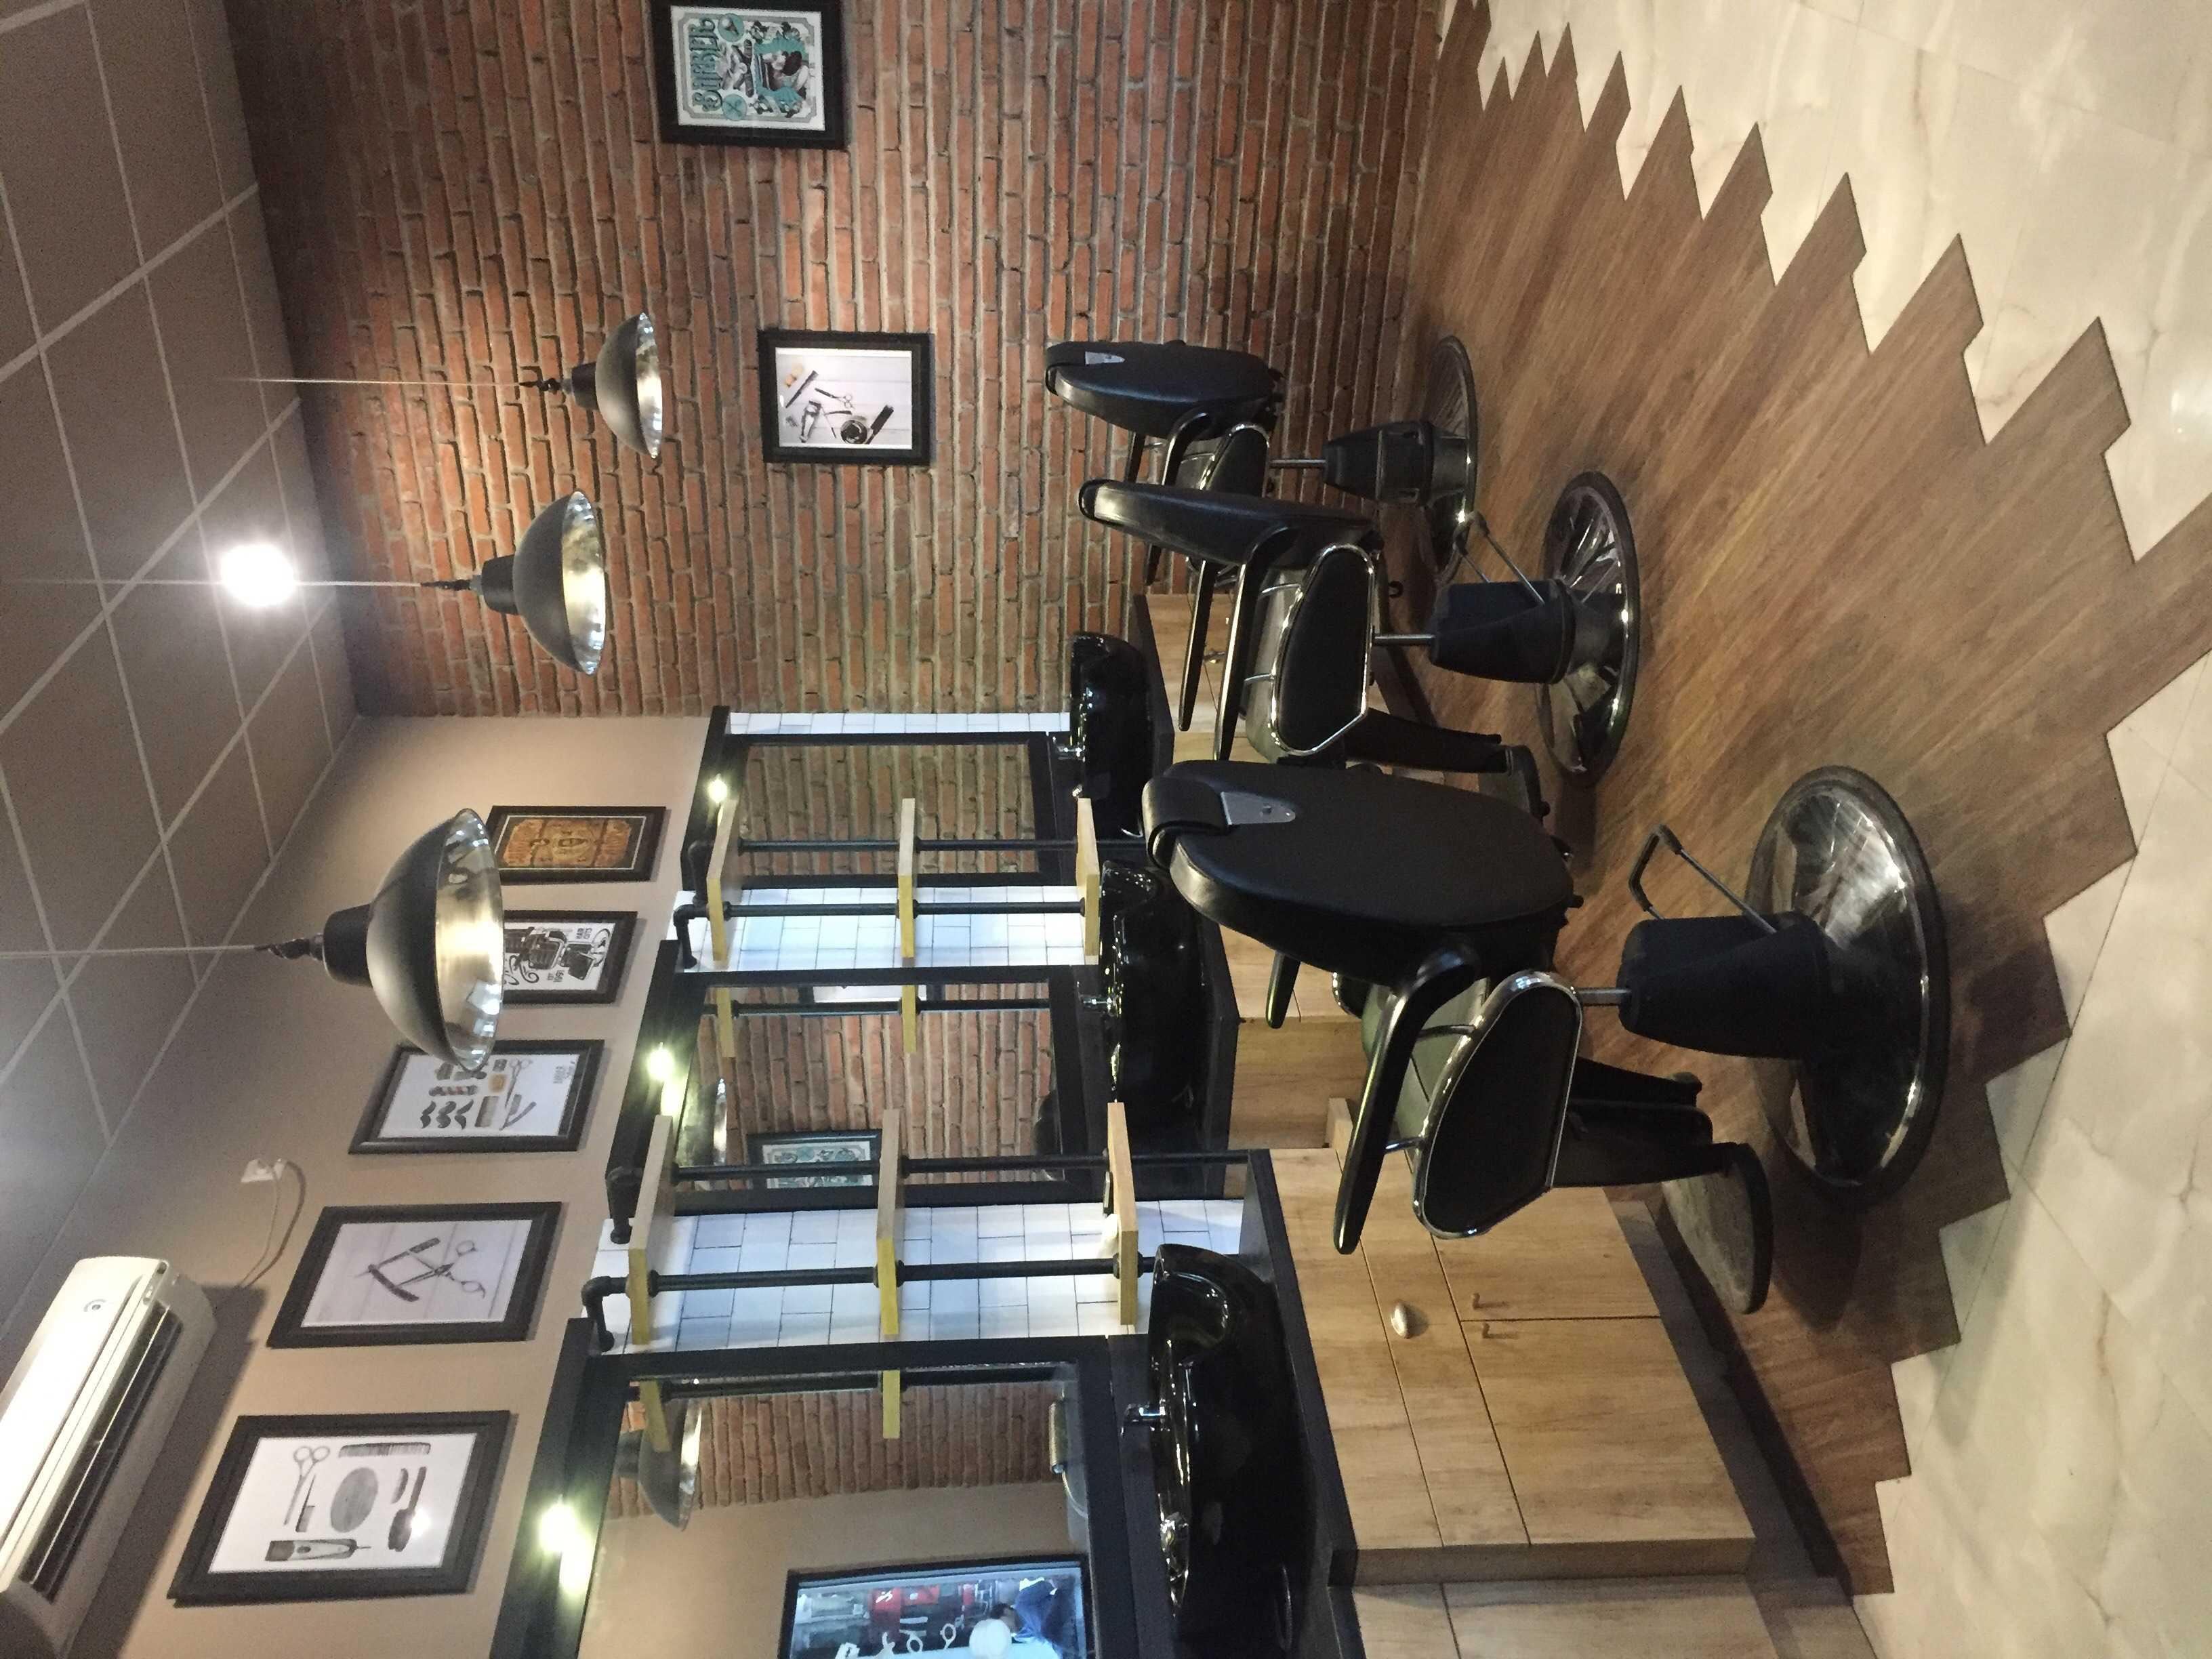 Aditya Wira Hardi Design Interior Barbershop Kabupaten Sidoarjo, Jawa Timur, Indonesia Kabupaten Sidoarjo, Jawa Timur, Indonesia Aditya-Wira-Hardi-Design-Interior-Barbershop   66090